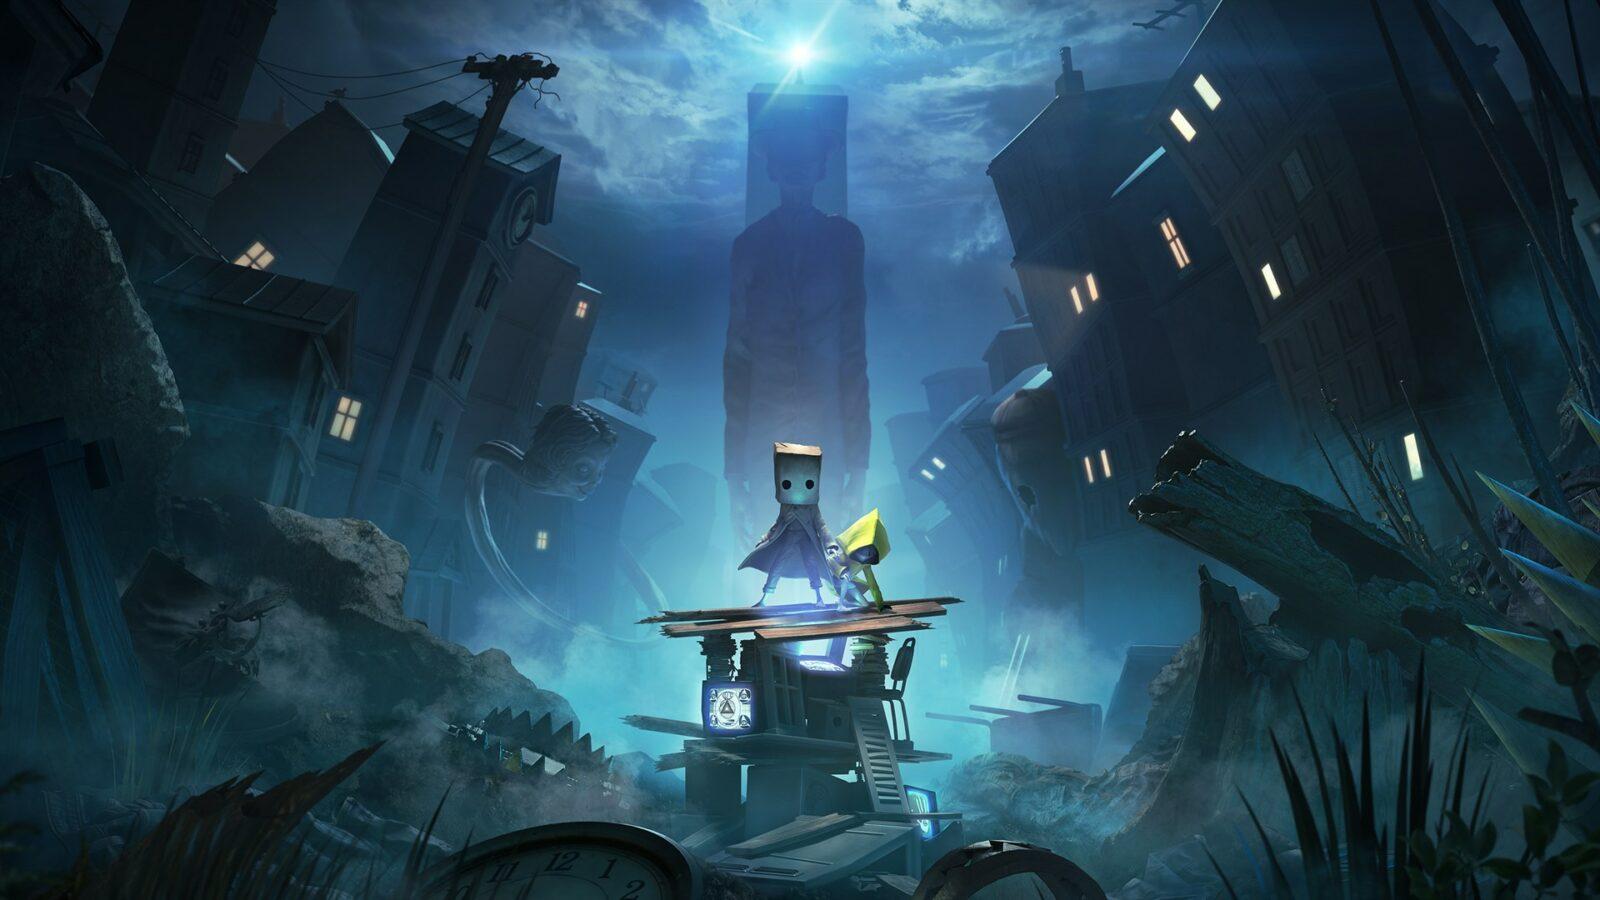 2021-mid-year-summer-best-games-little-nightmares-2-indie-cover